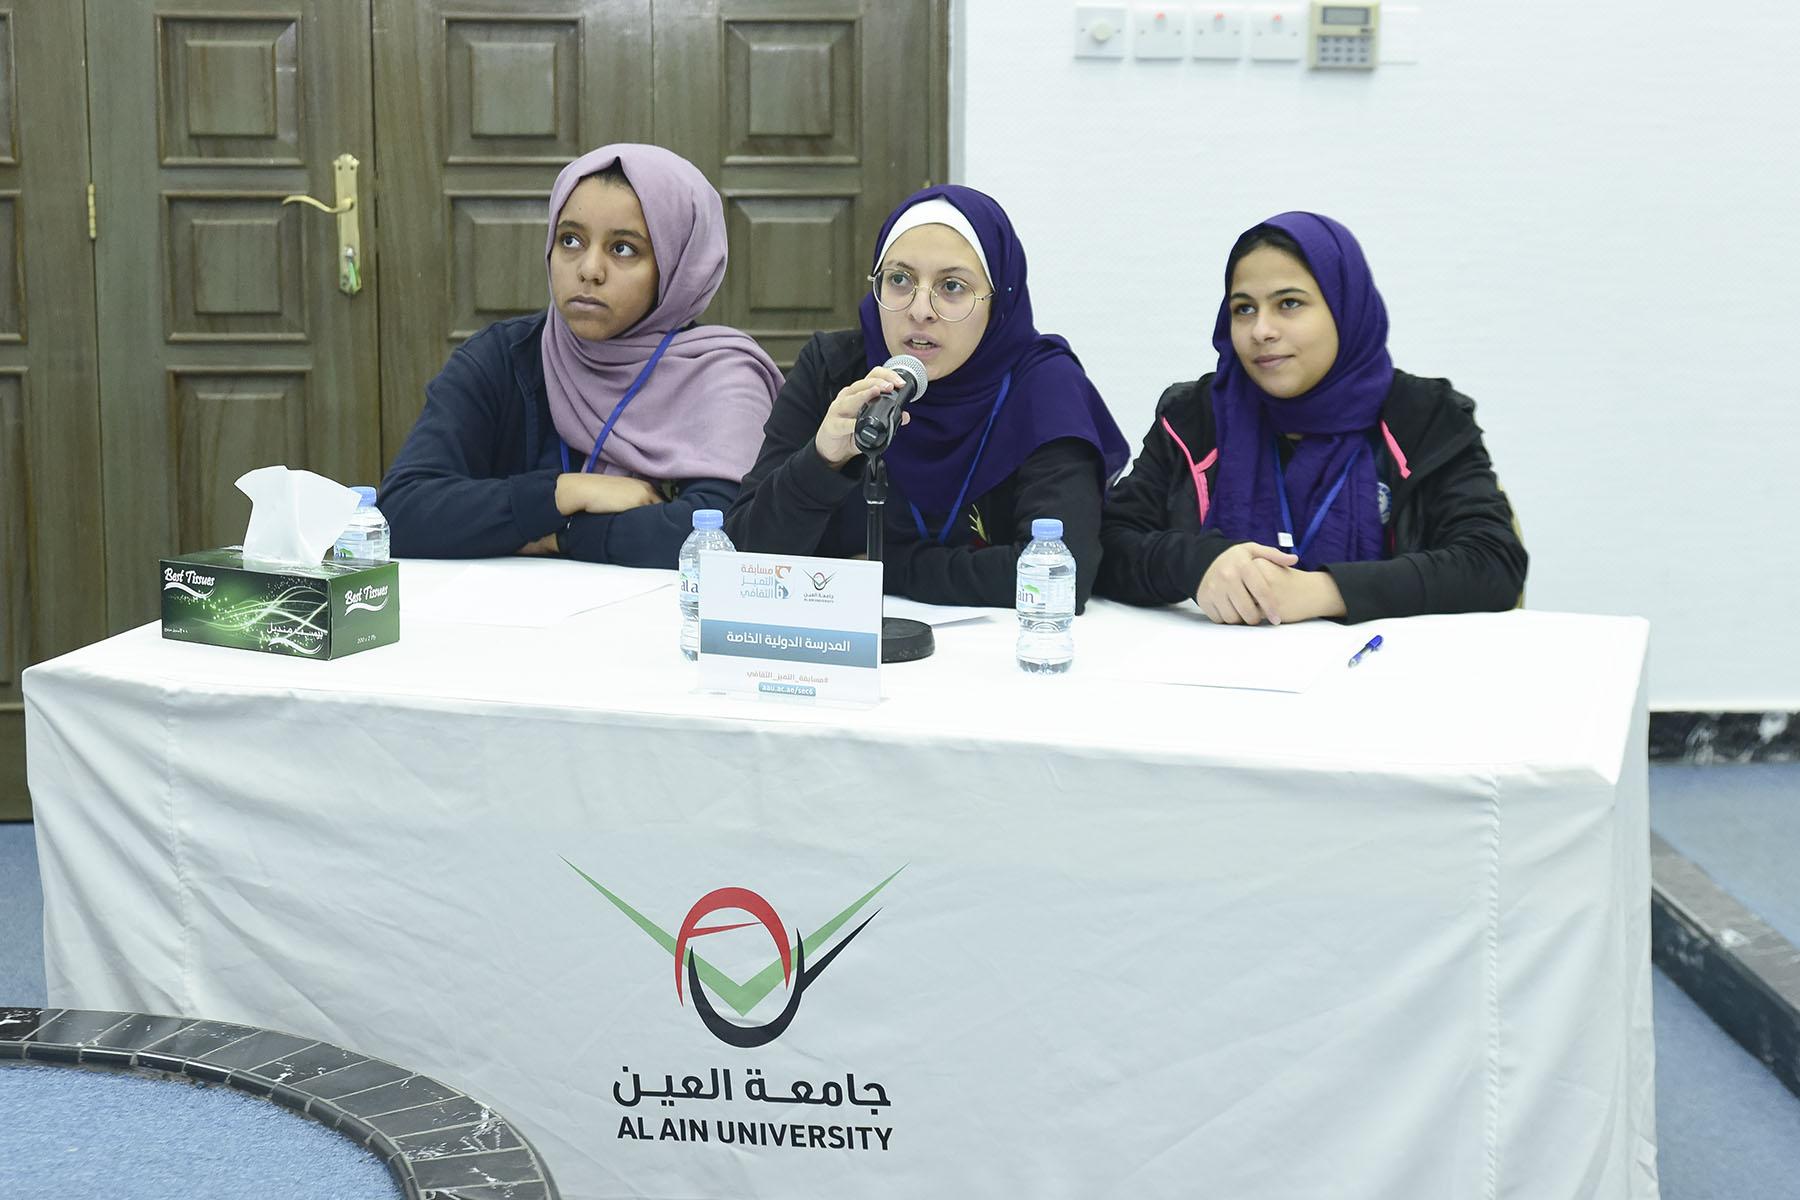 Fifth Day (International Private School VS Dar Al Uloom Private School)